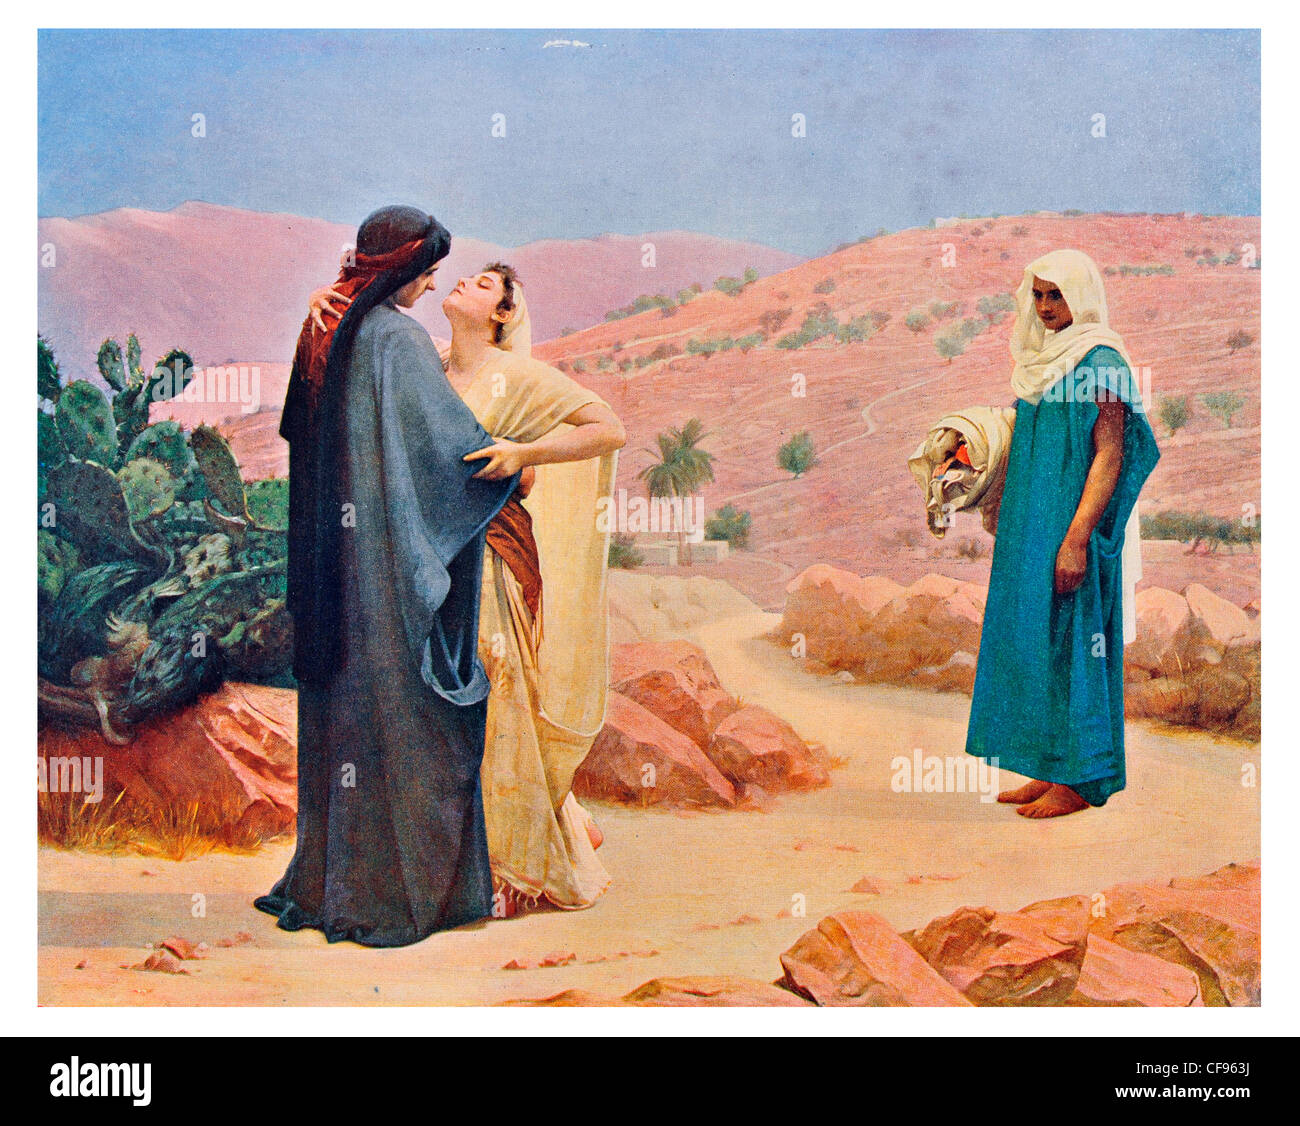 ruth and naomi by philip hermogenes calderon arab desert jerusalem